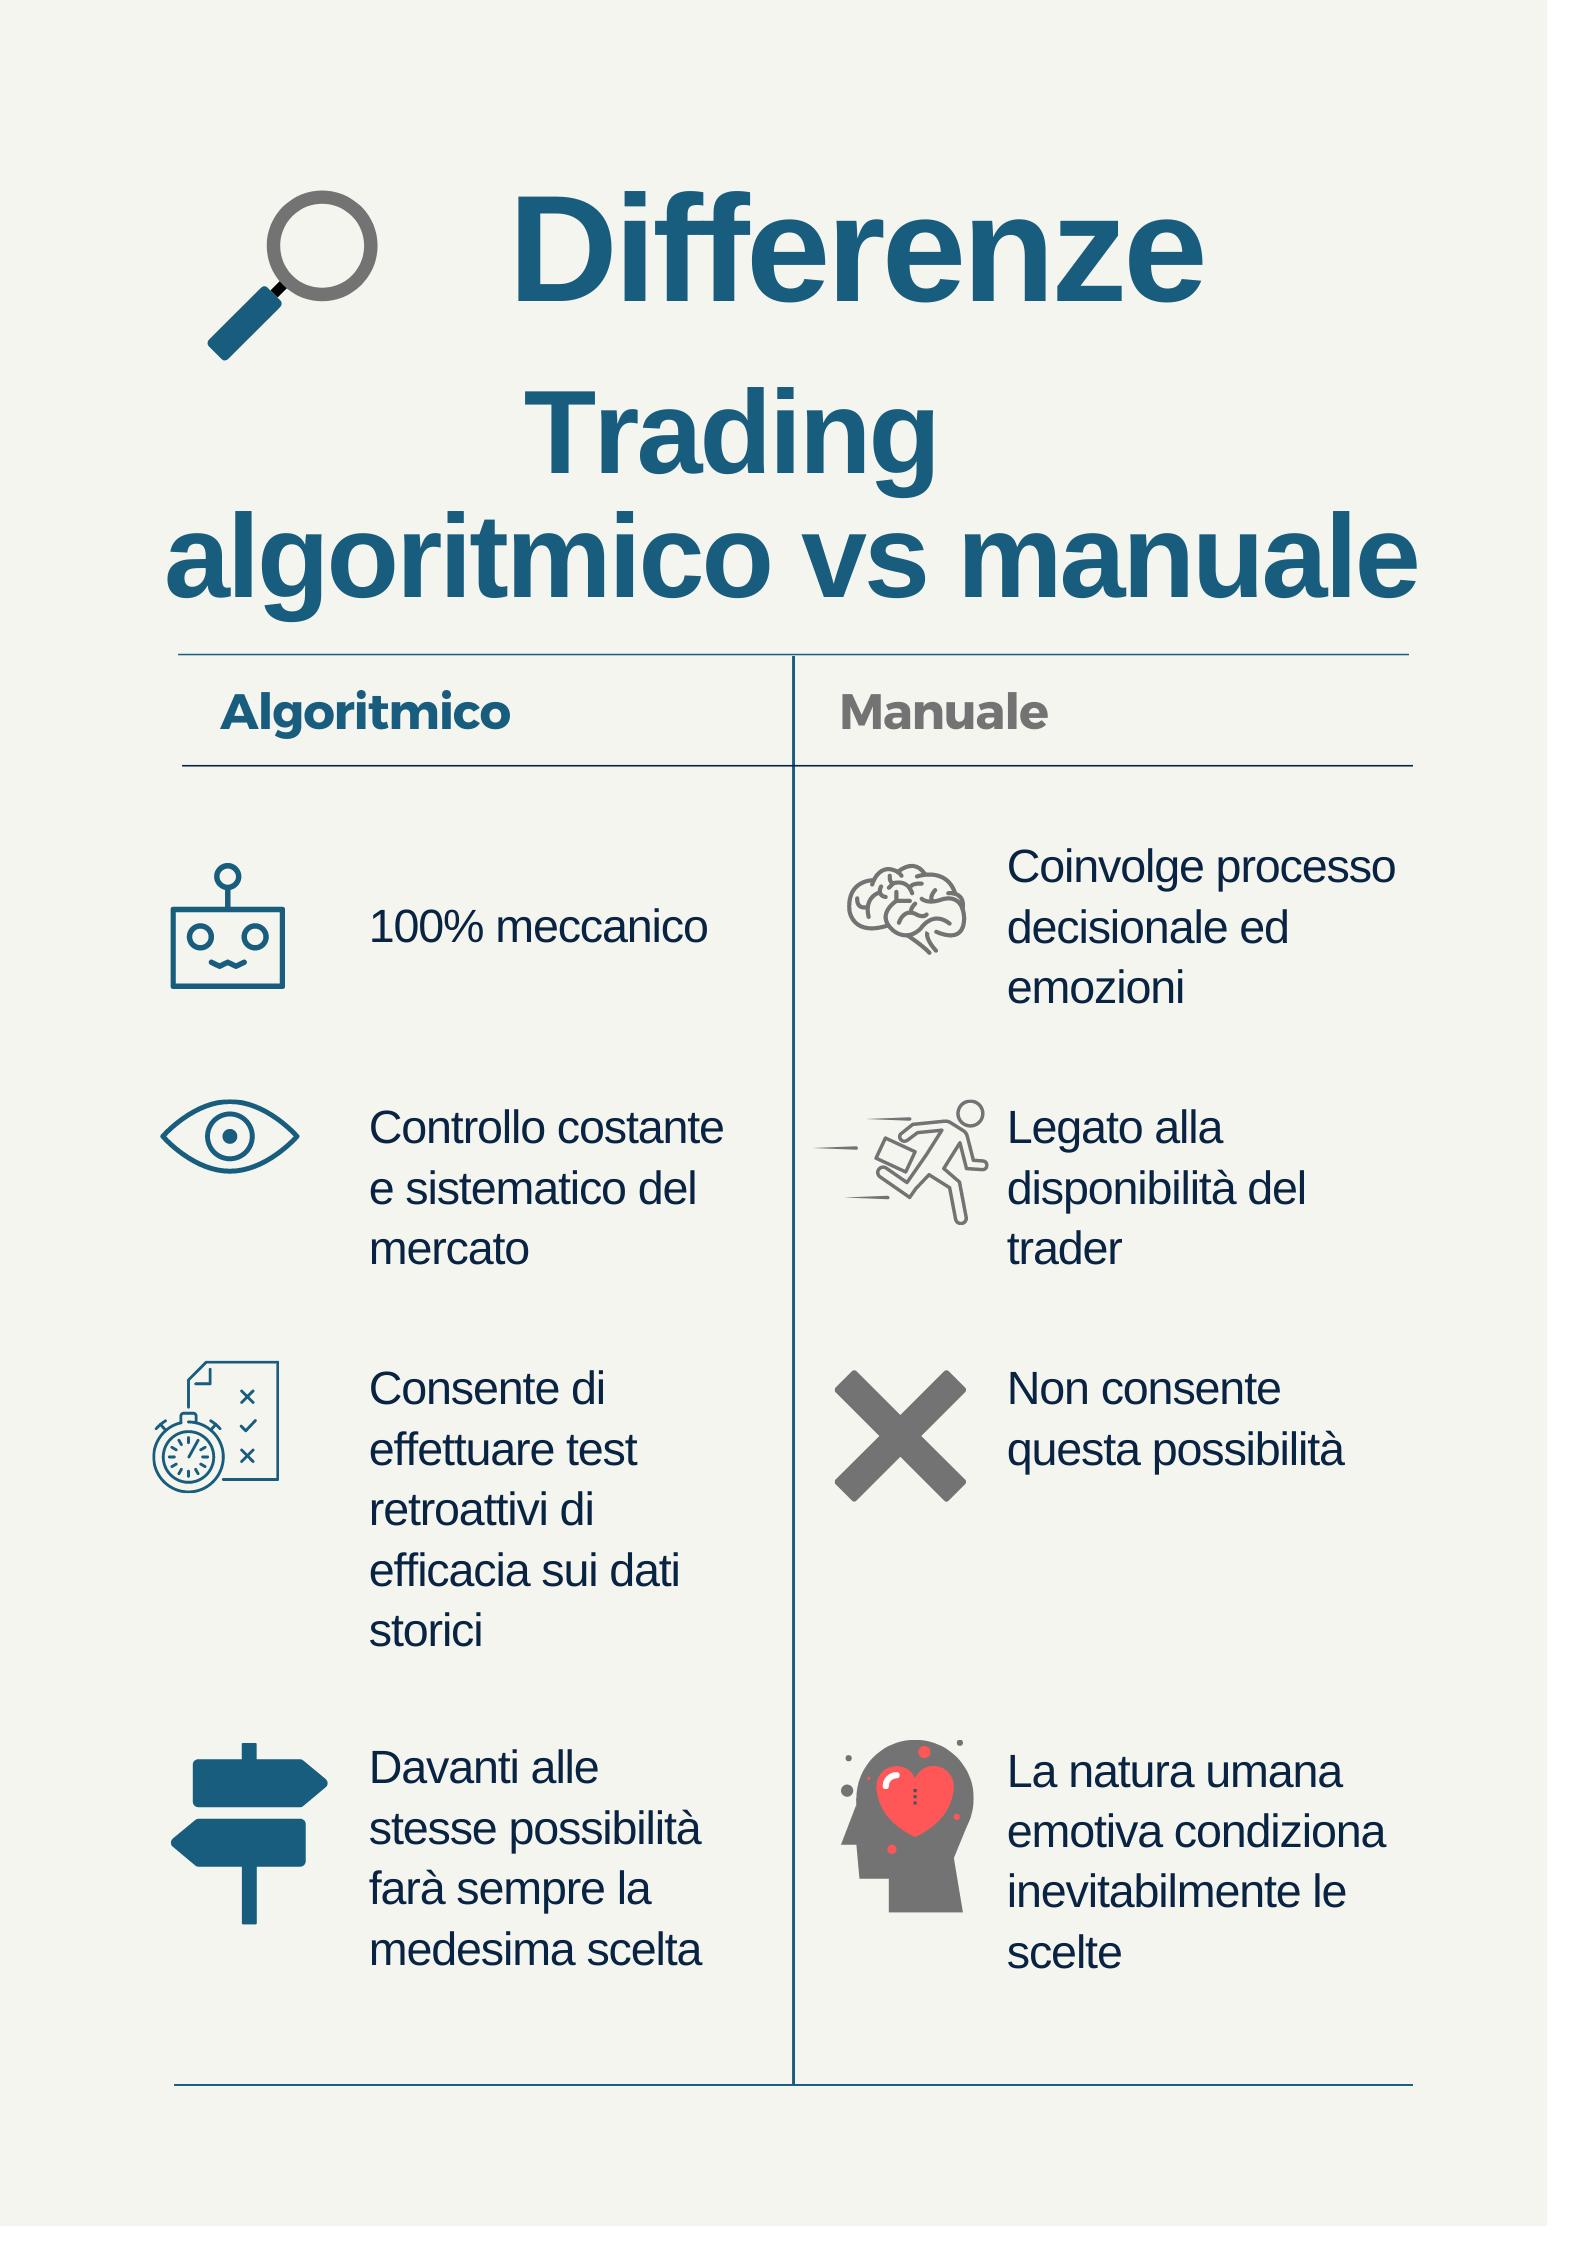 differenze-trading-algoritmico-vs-manuale